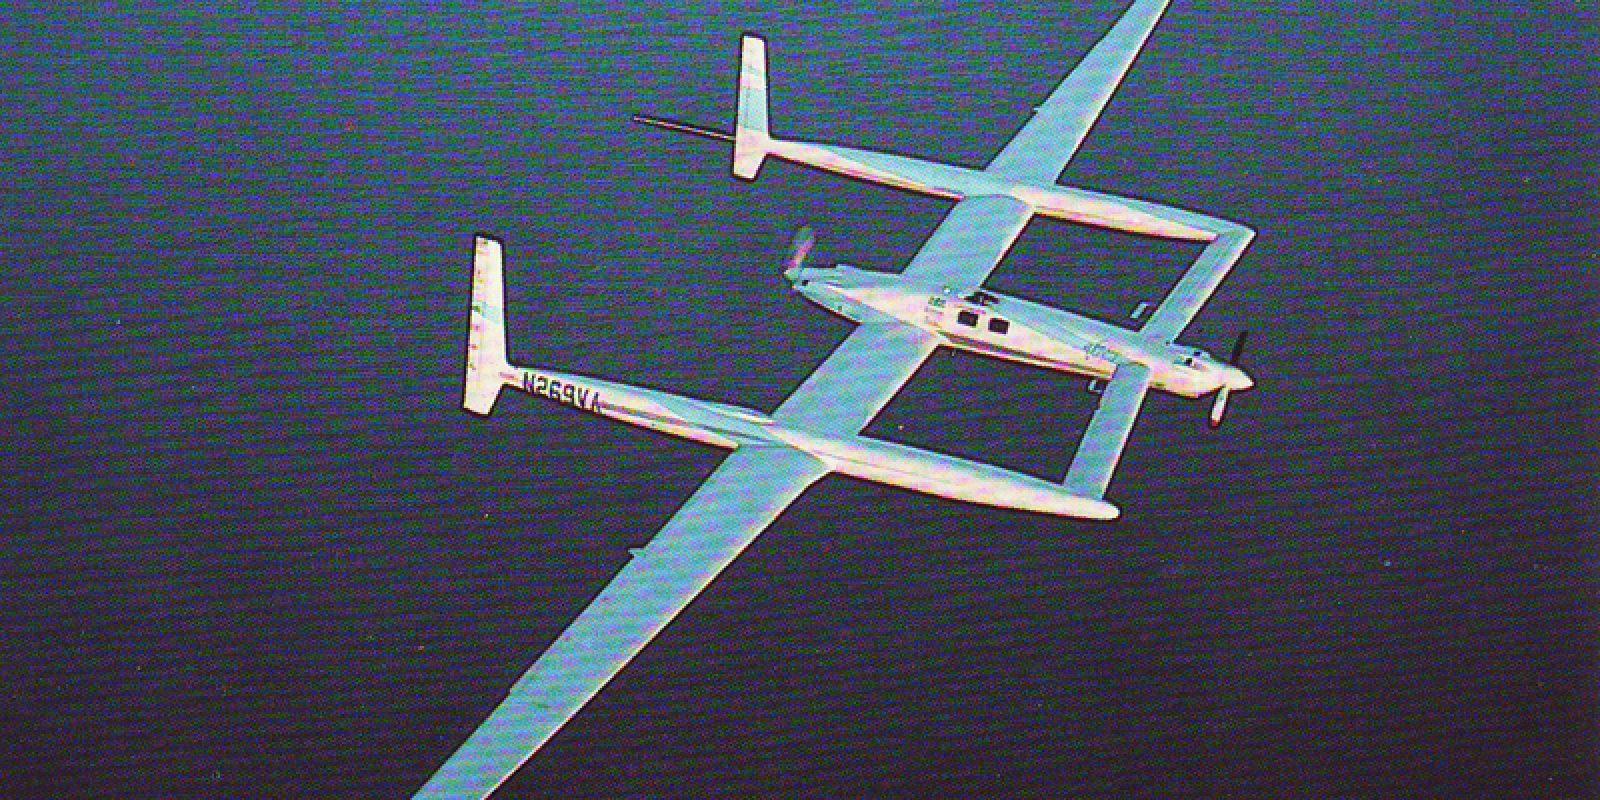 Voyager_0_vignet.jpg